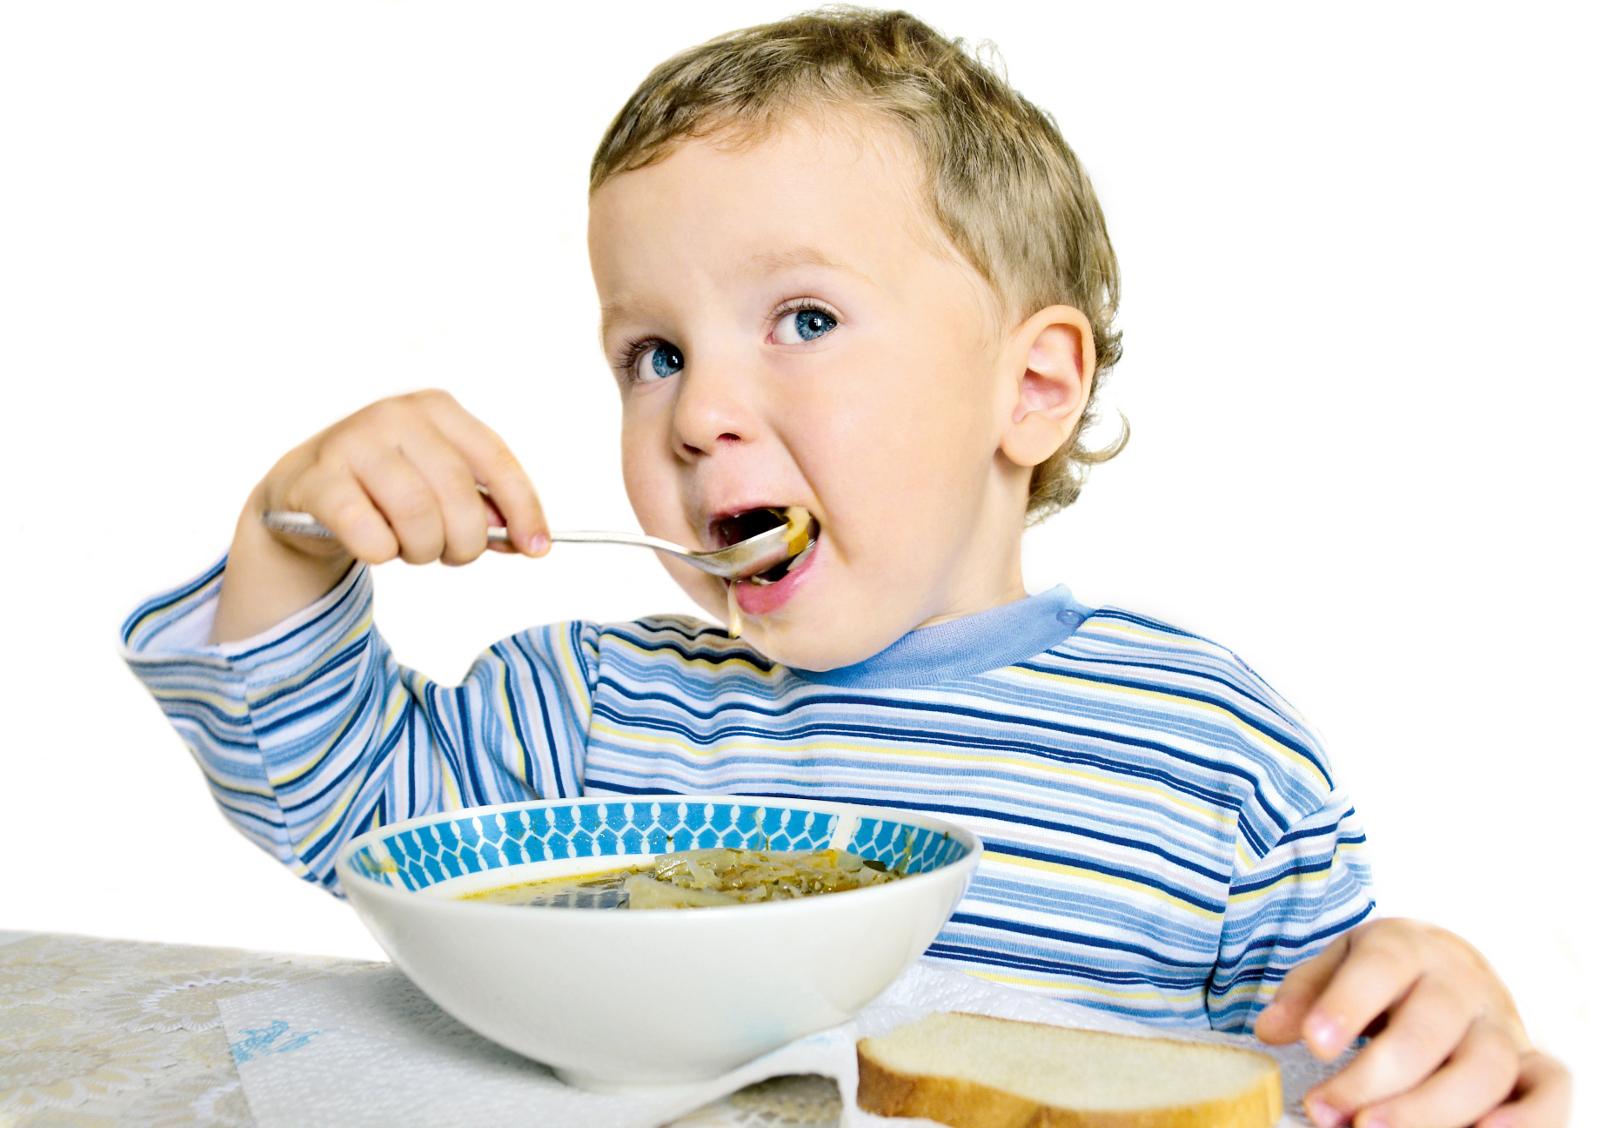 Abrir el apetito a un niño